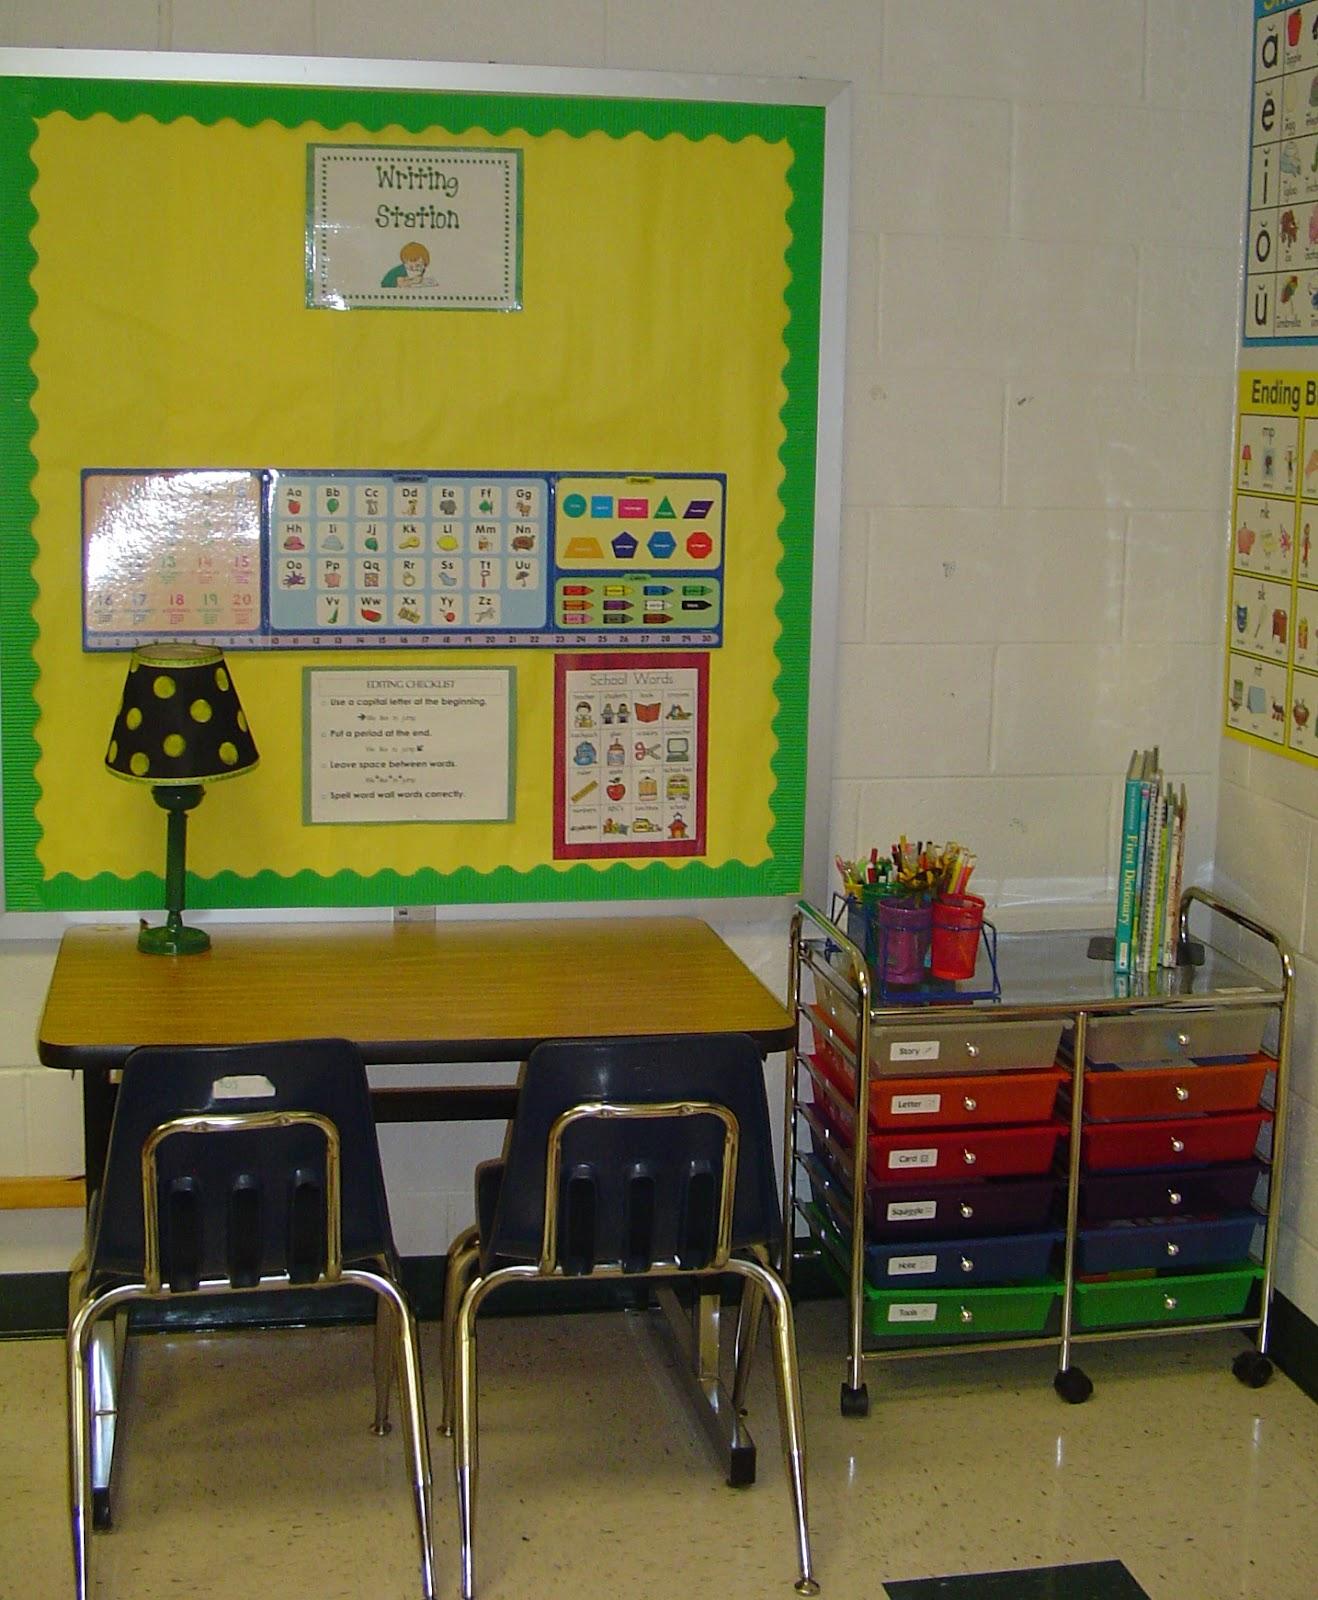 Stations Classroom Design Definition ~ Classroom design reflection teaching in progress